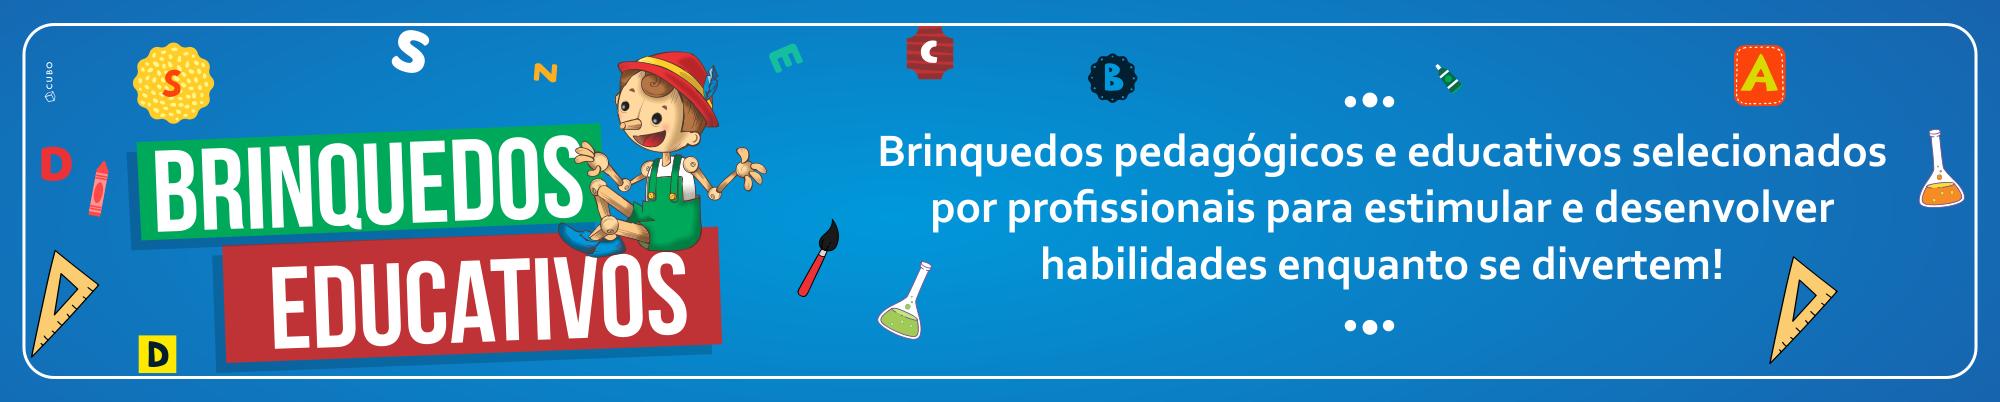 pedagogicos-31586455204991511403-cd83082d36c0a0de94c5a129621de91a15876762731505648824.png